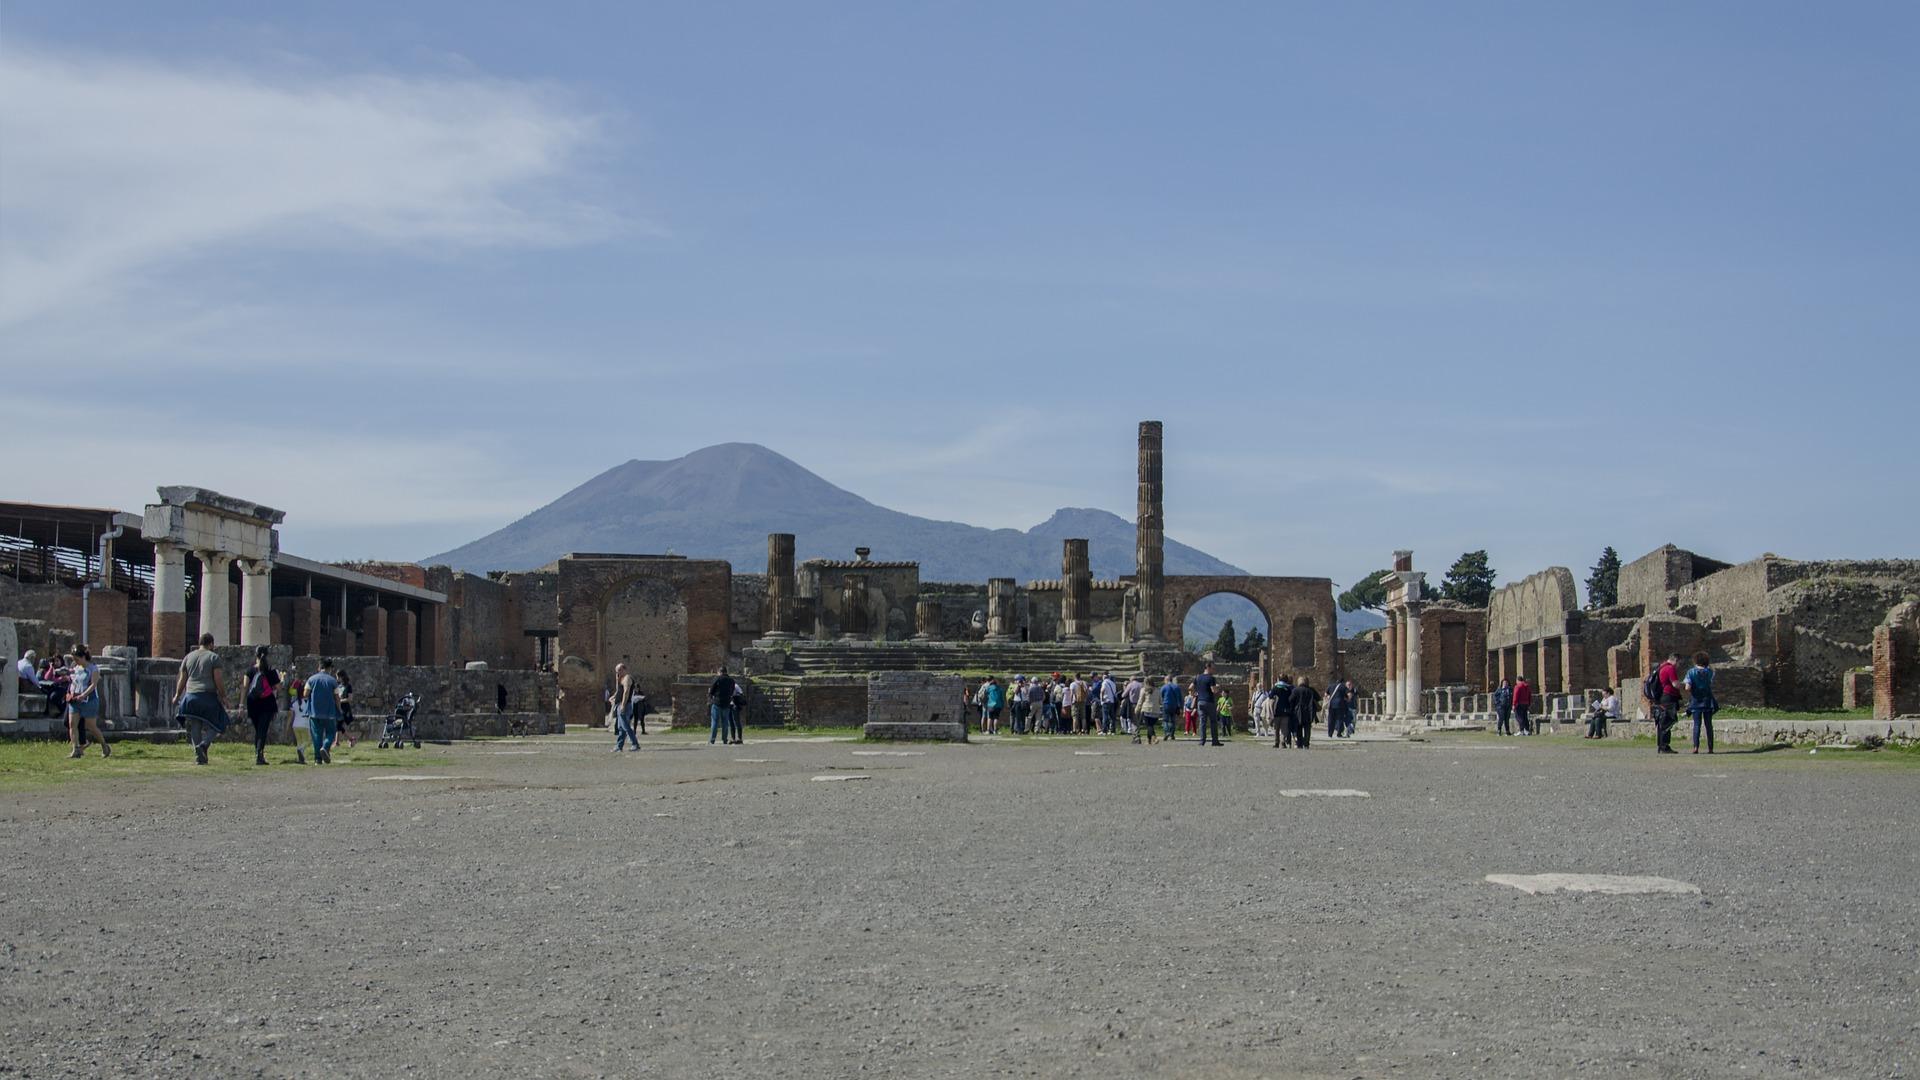 pompei-ruins-1233933_1920.jpg